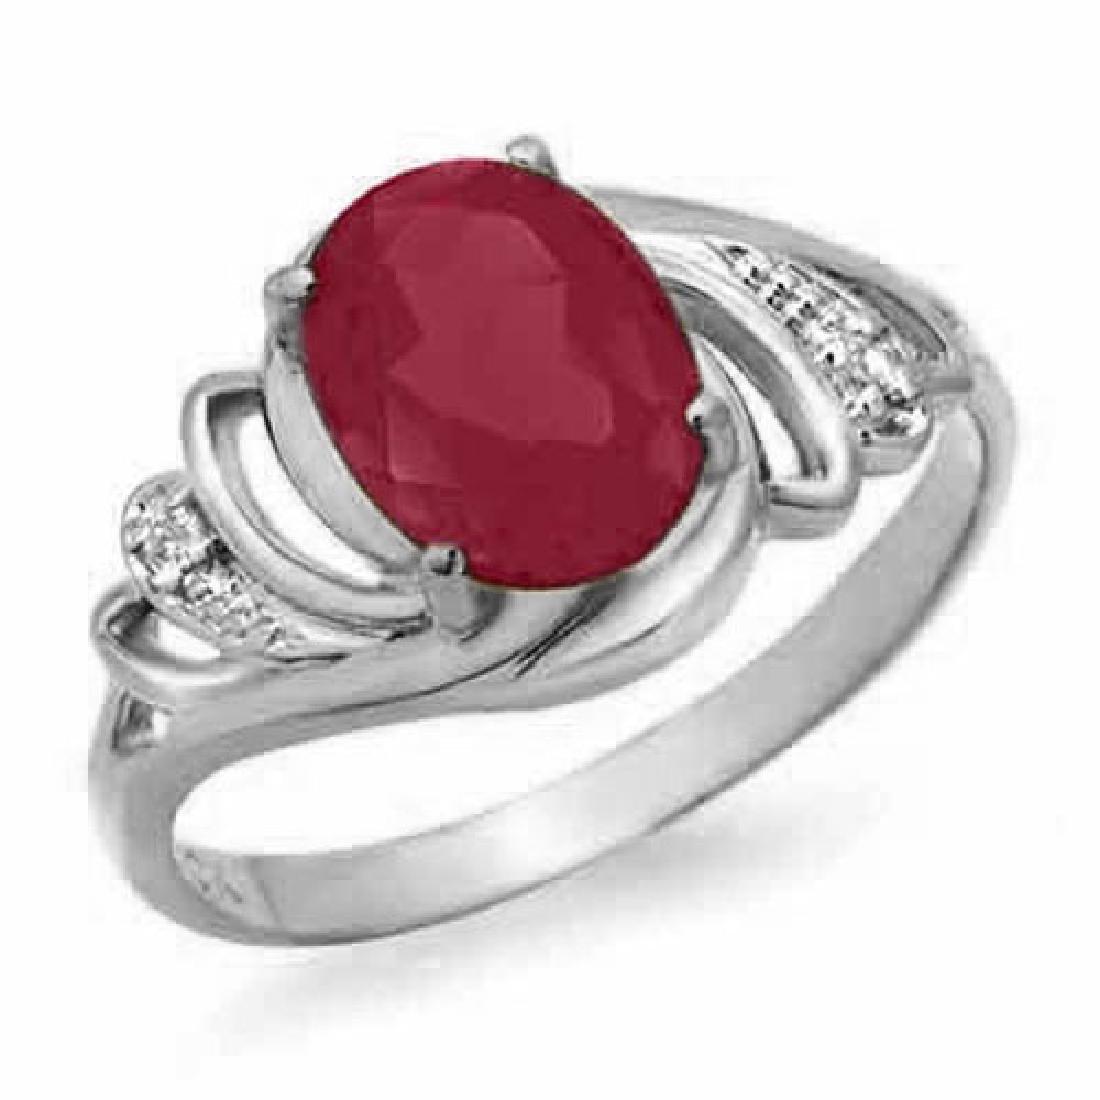 2.25 CTW Ruby & Diamond Ring 18K White Gold